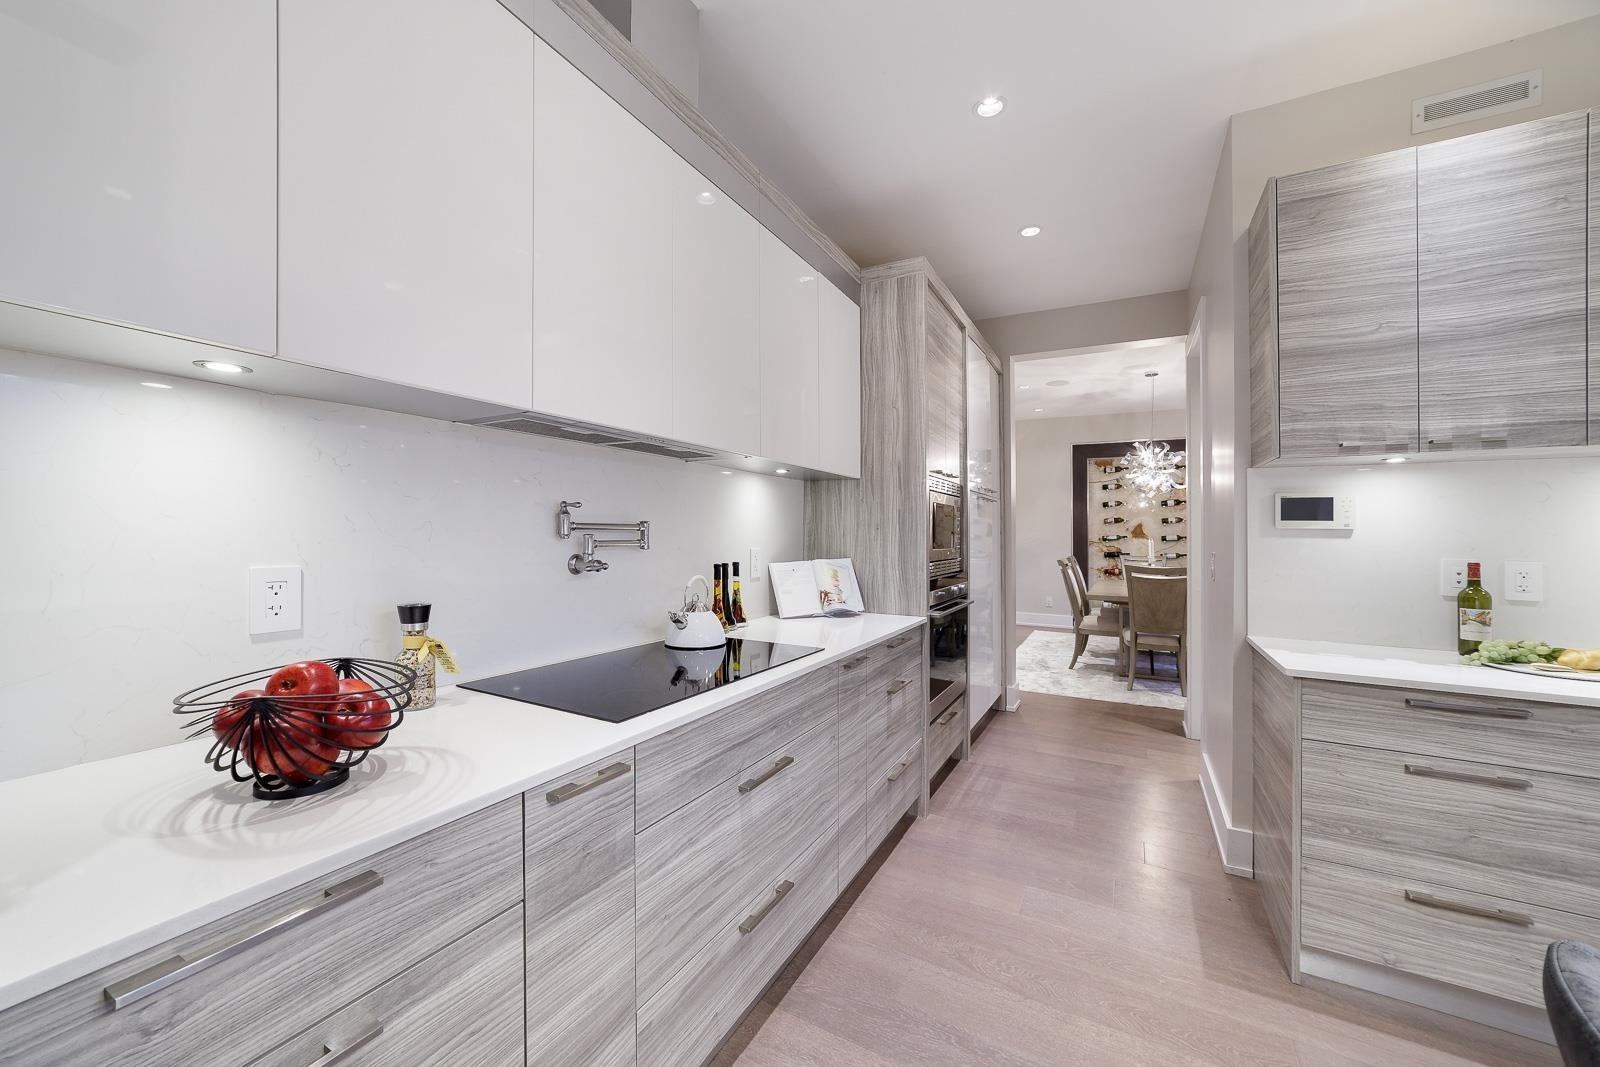 517 GRANADA CRESCENT - Upper Delbrook House/Single Family for sale, 8 Bedrooms (R2615057) - #9